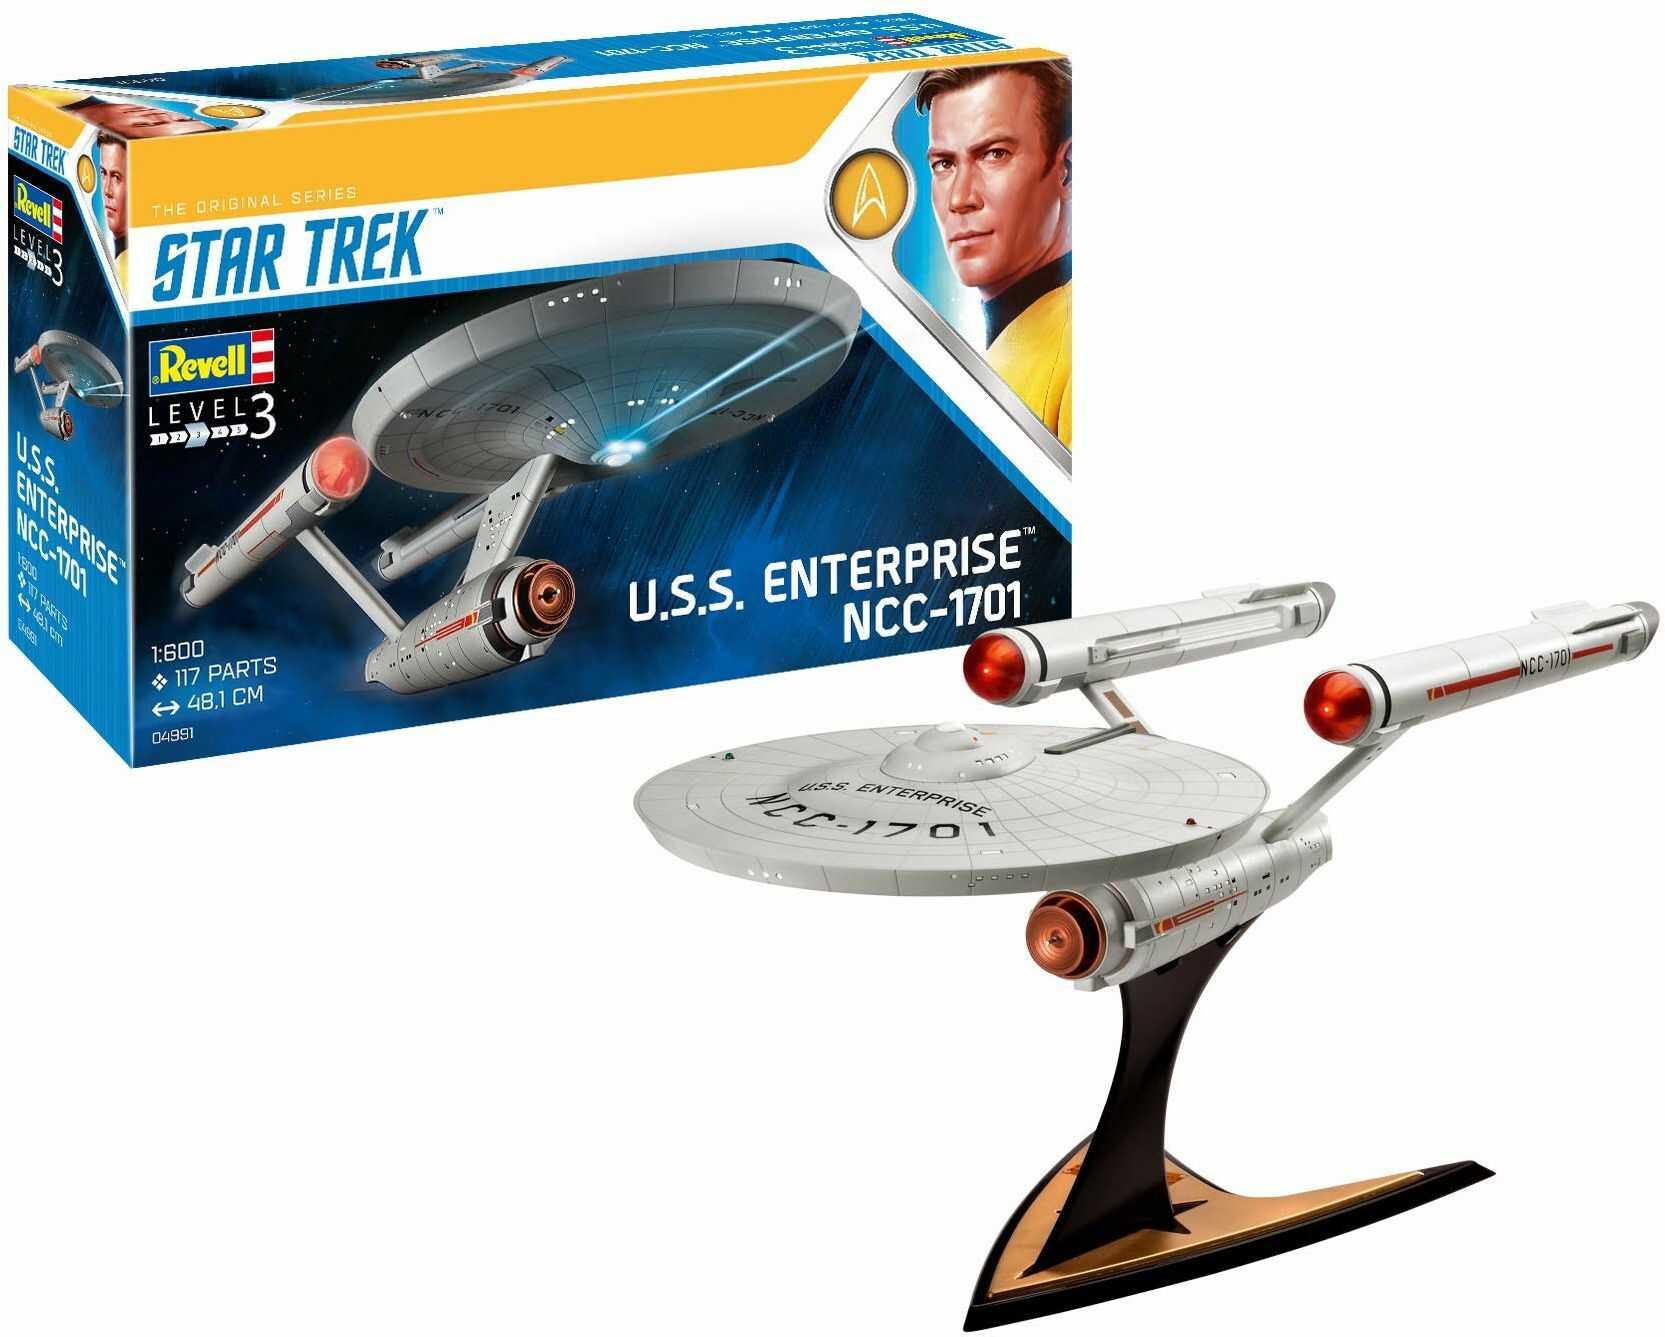 Revell RV04991 04991 4991 1:600 Okręt Enterprise NCC-1701 (TOS) Zestaw plastikowych modeli Star Trek James T. Kirk, różne, 1/600